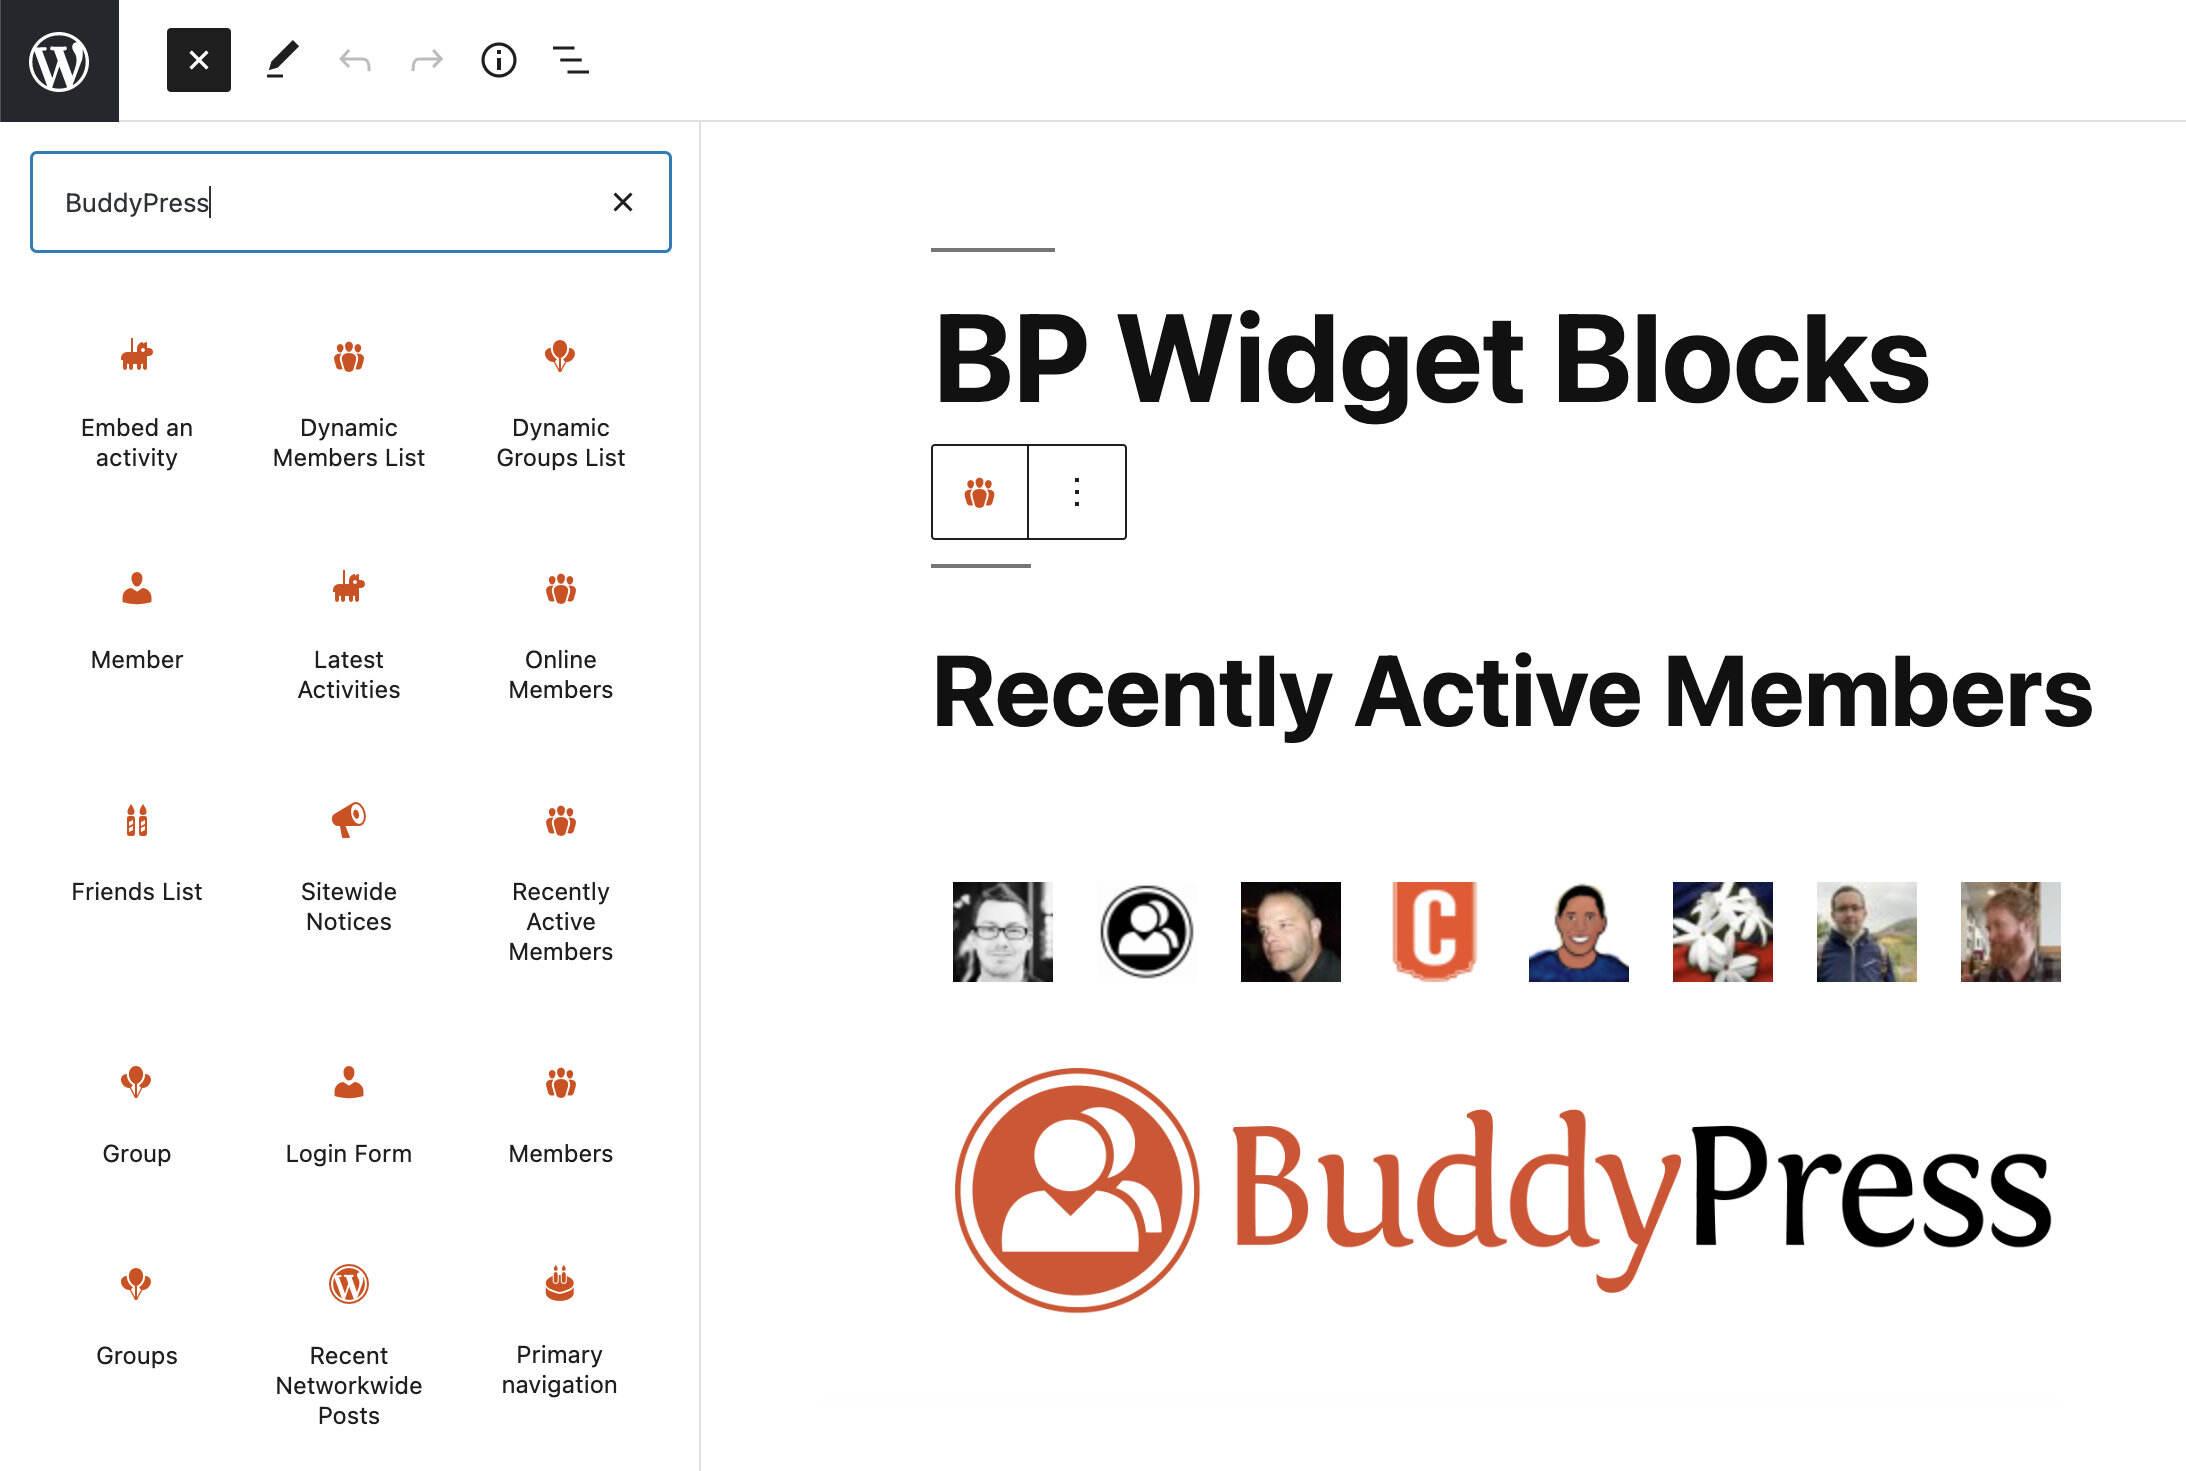 bp-widget-blocks